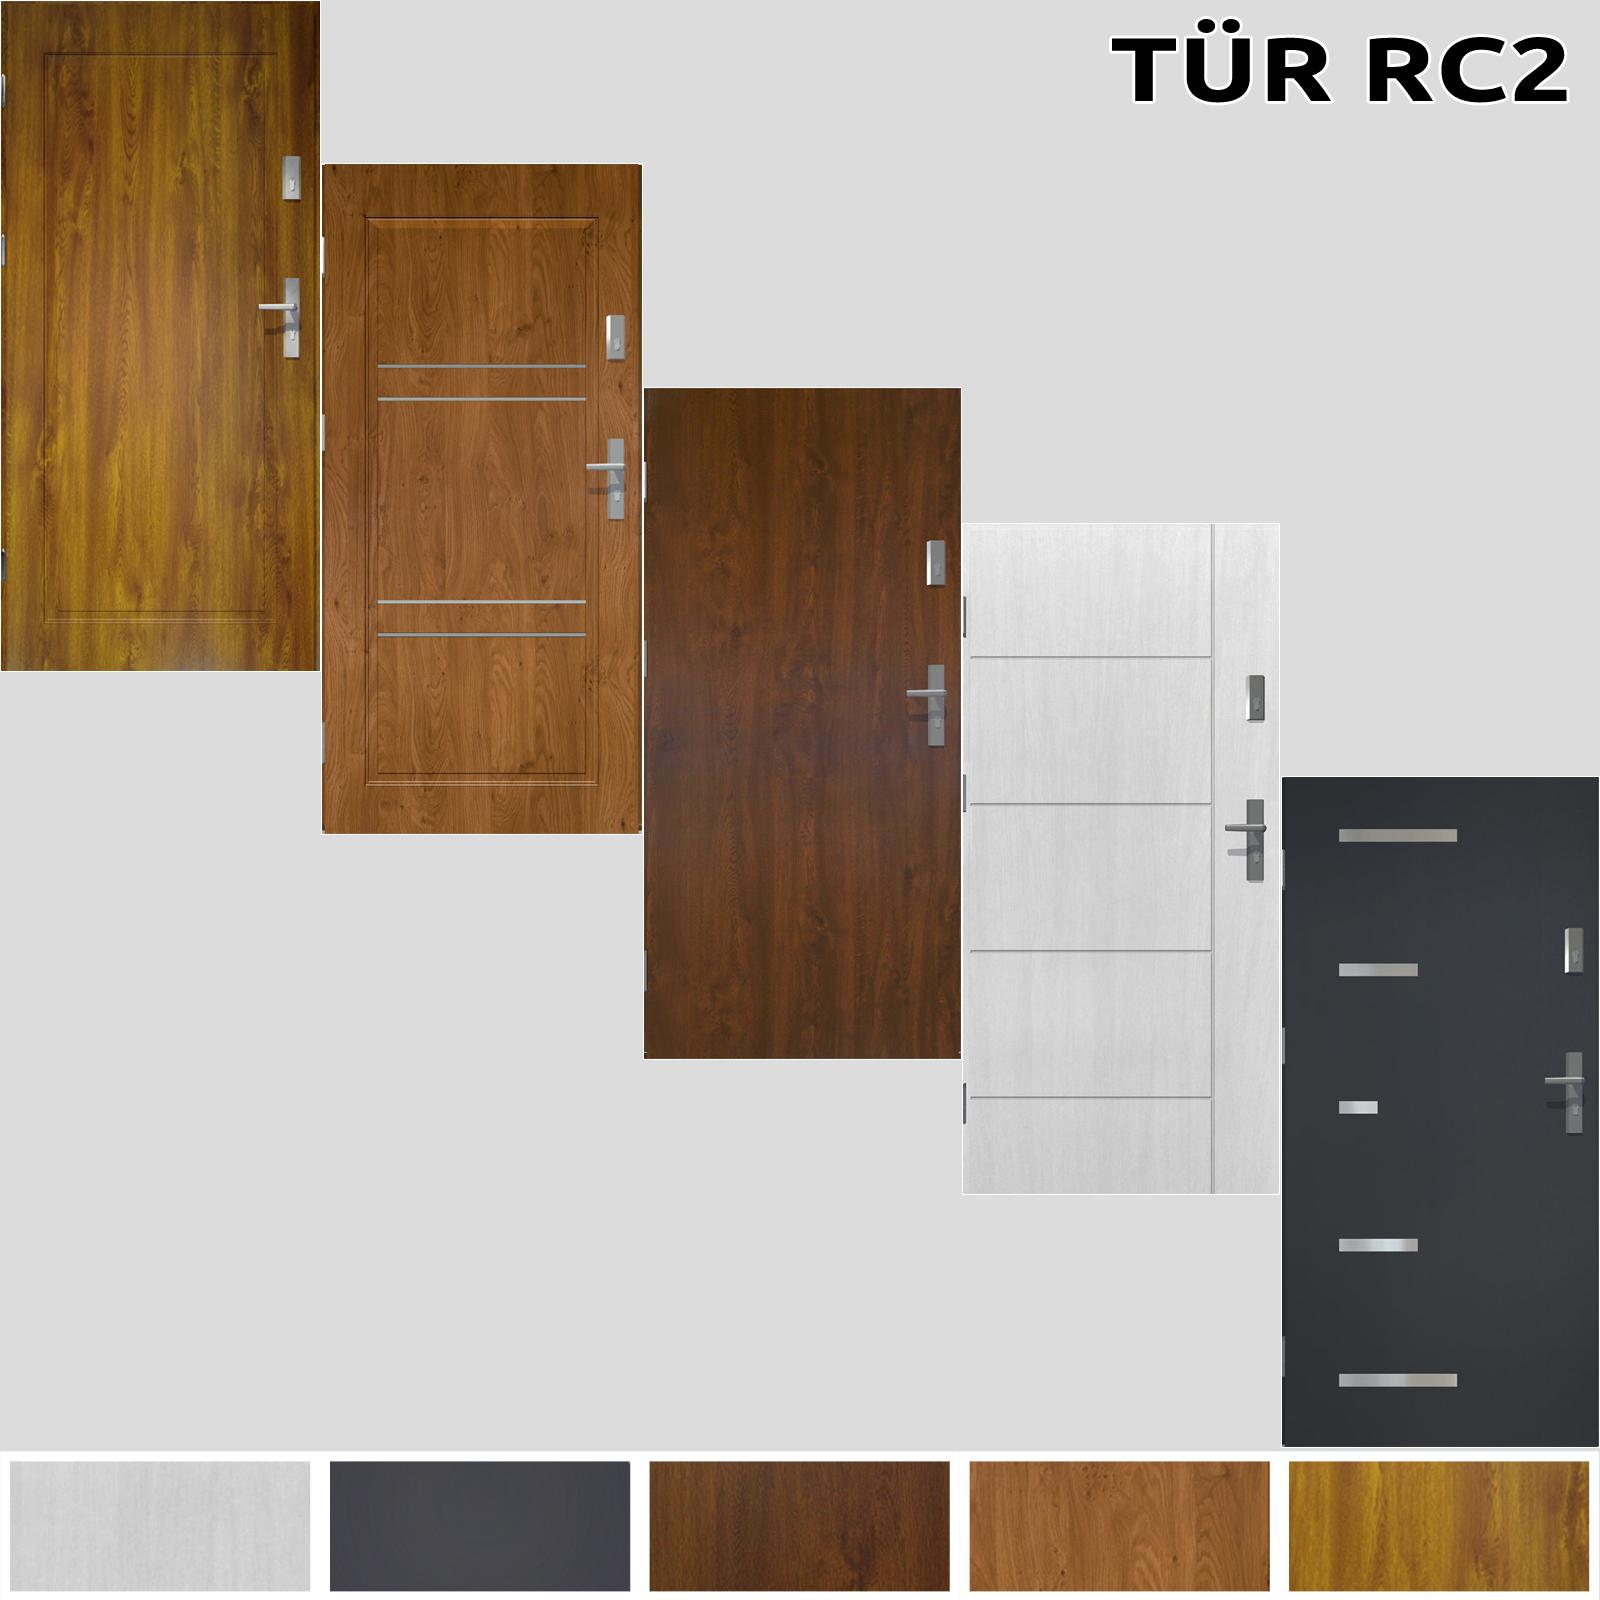 t r prime55 rc 2 4 haust r eingangst r stahlt r 80 90 100 wohnungeingangst r ebay. Black Bedroom Furniture Sets. Home Design Ideas